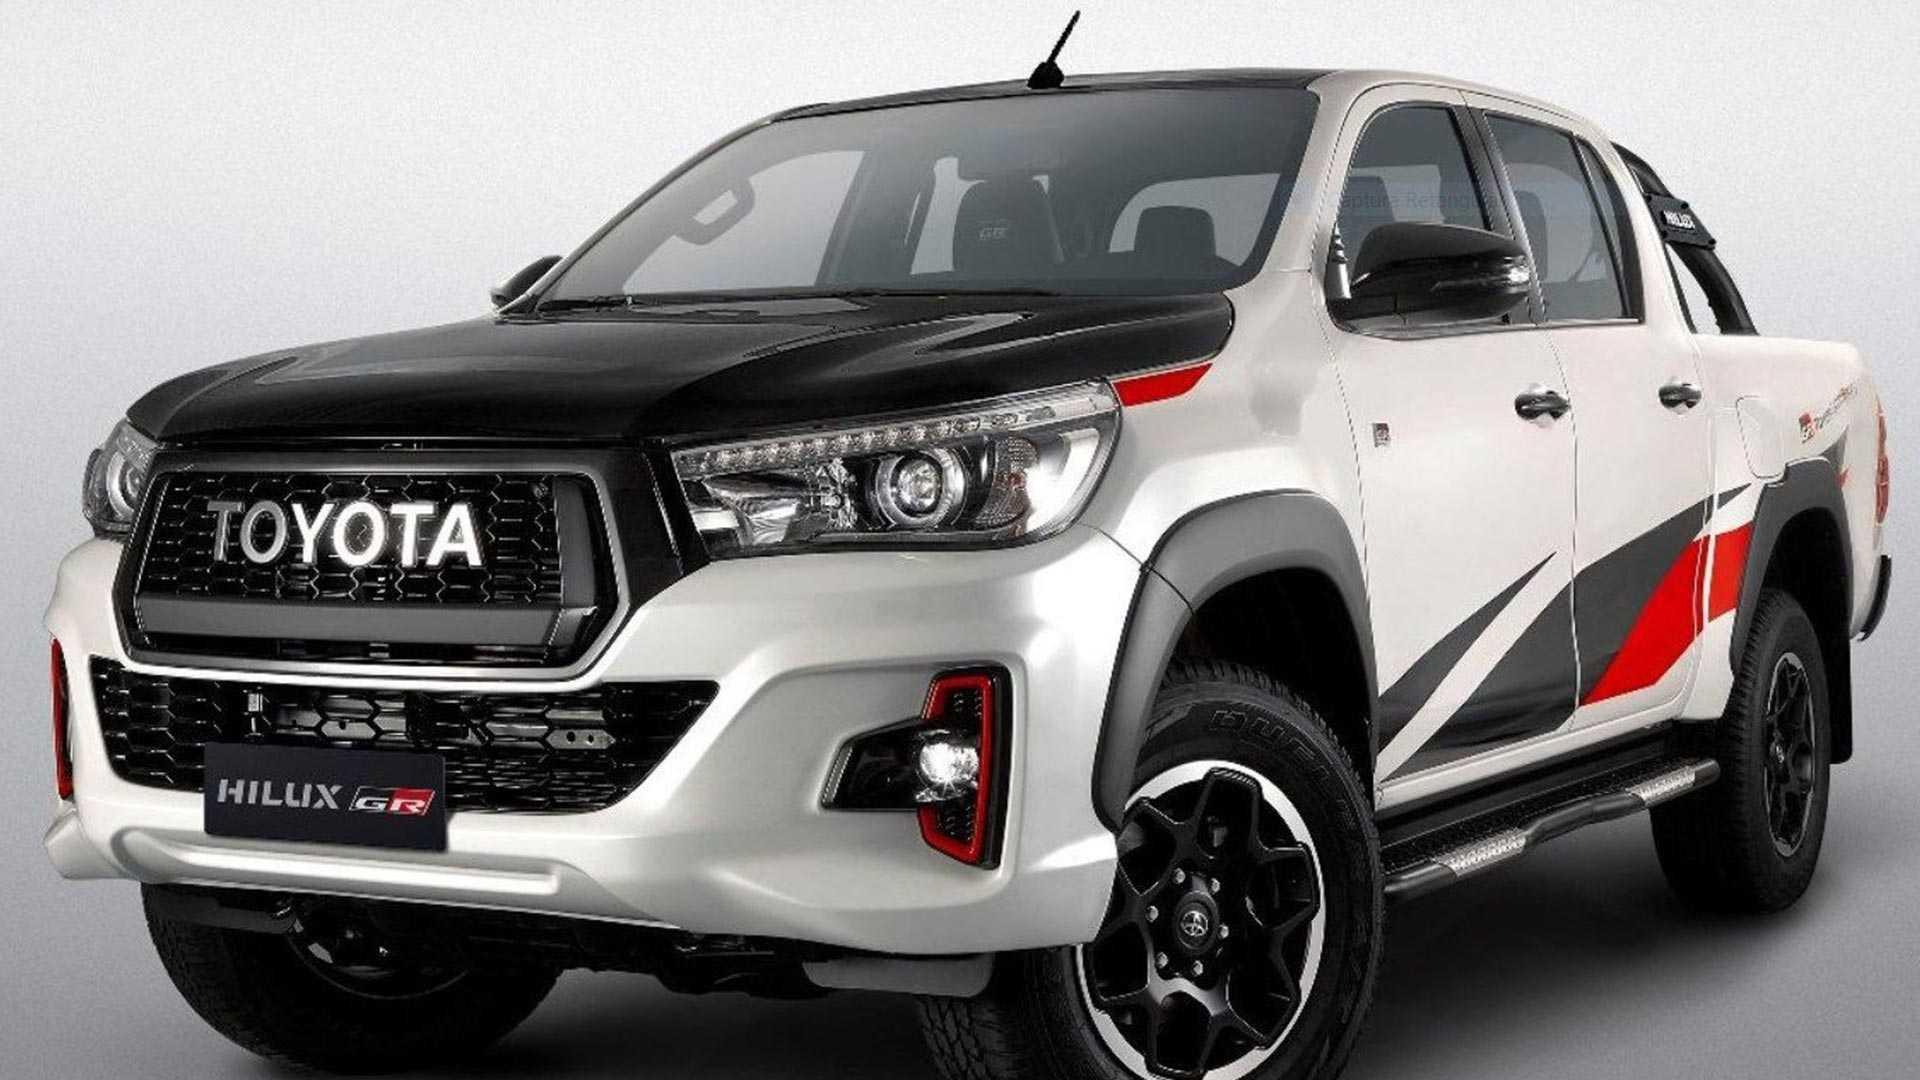 Kekurangan Toyota Ranger Spesifikasi